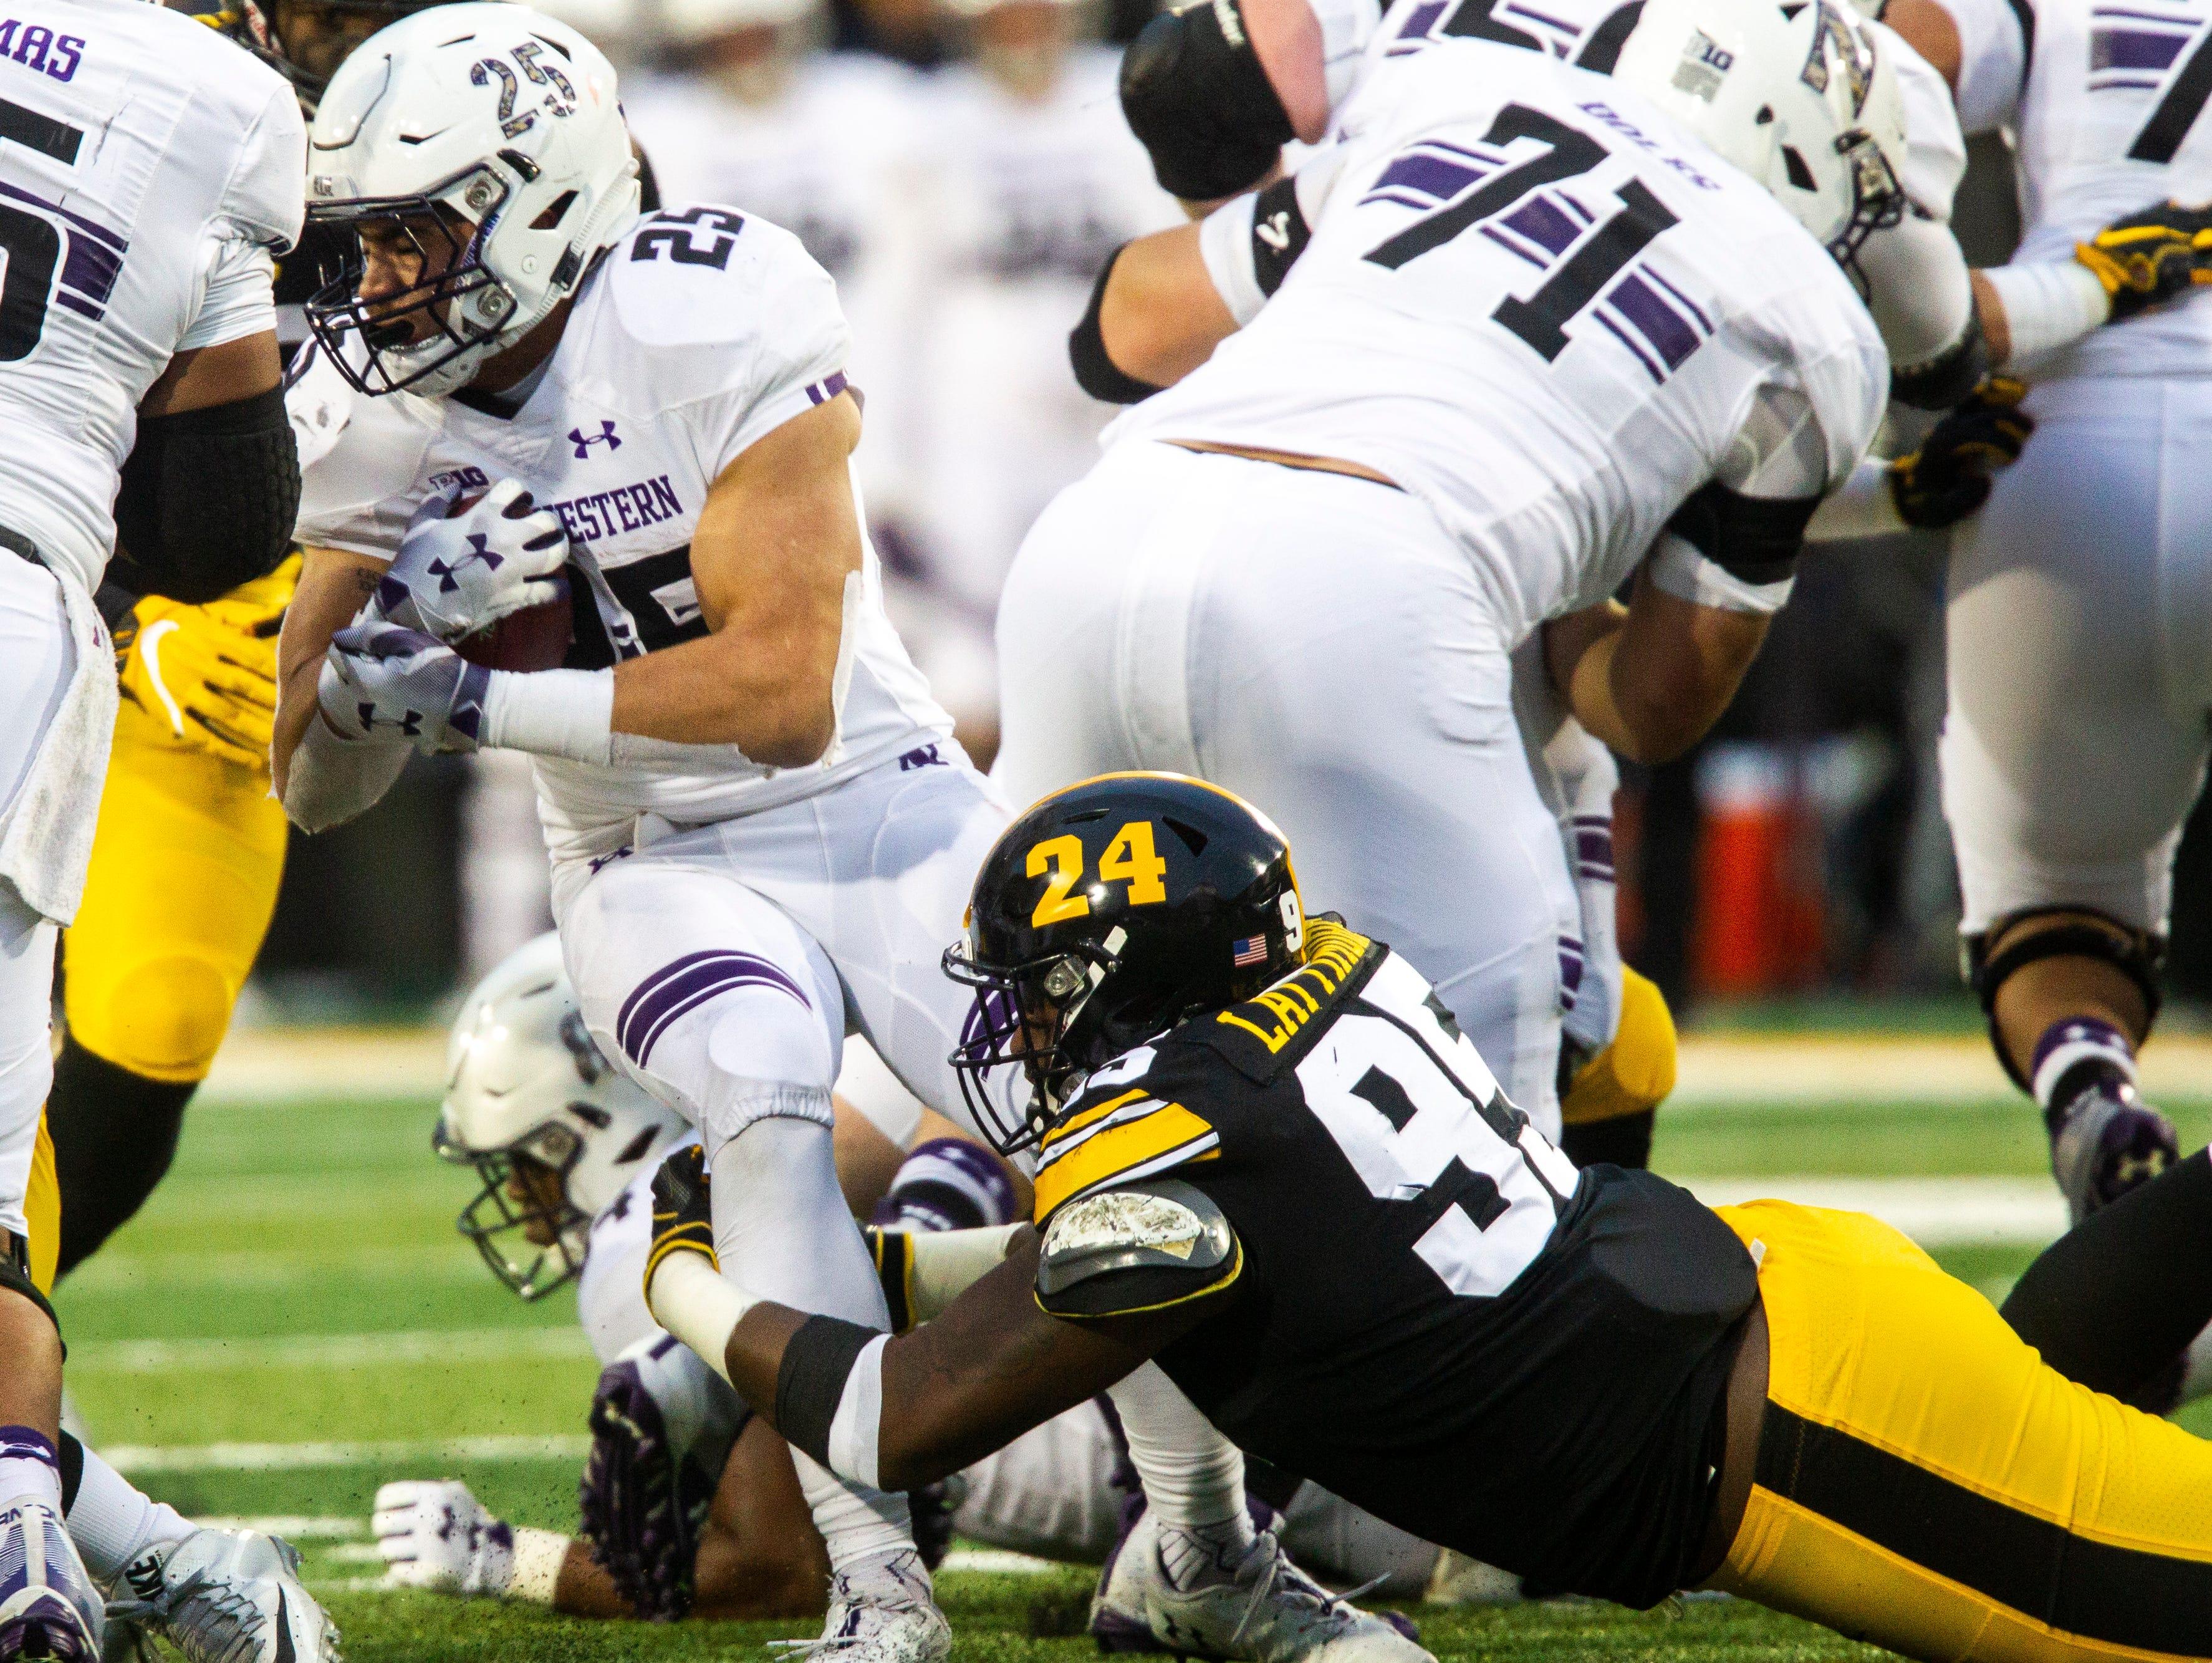 Iowa defensive lineman Cedrick Lattimore (95) tackles Northwestern's Isaiah Bowser (25) during a Big Ten Conference football game on Saturday, Nov. 10, 2018, at Kinnick Stadium in Iowa City.